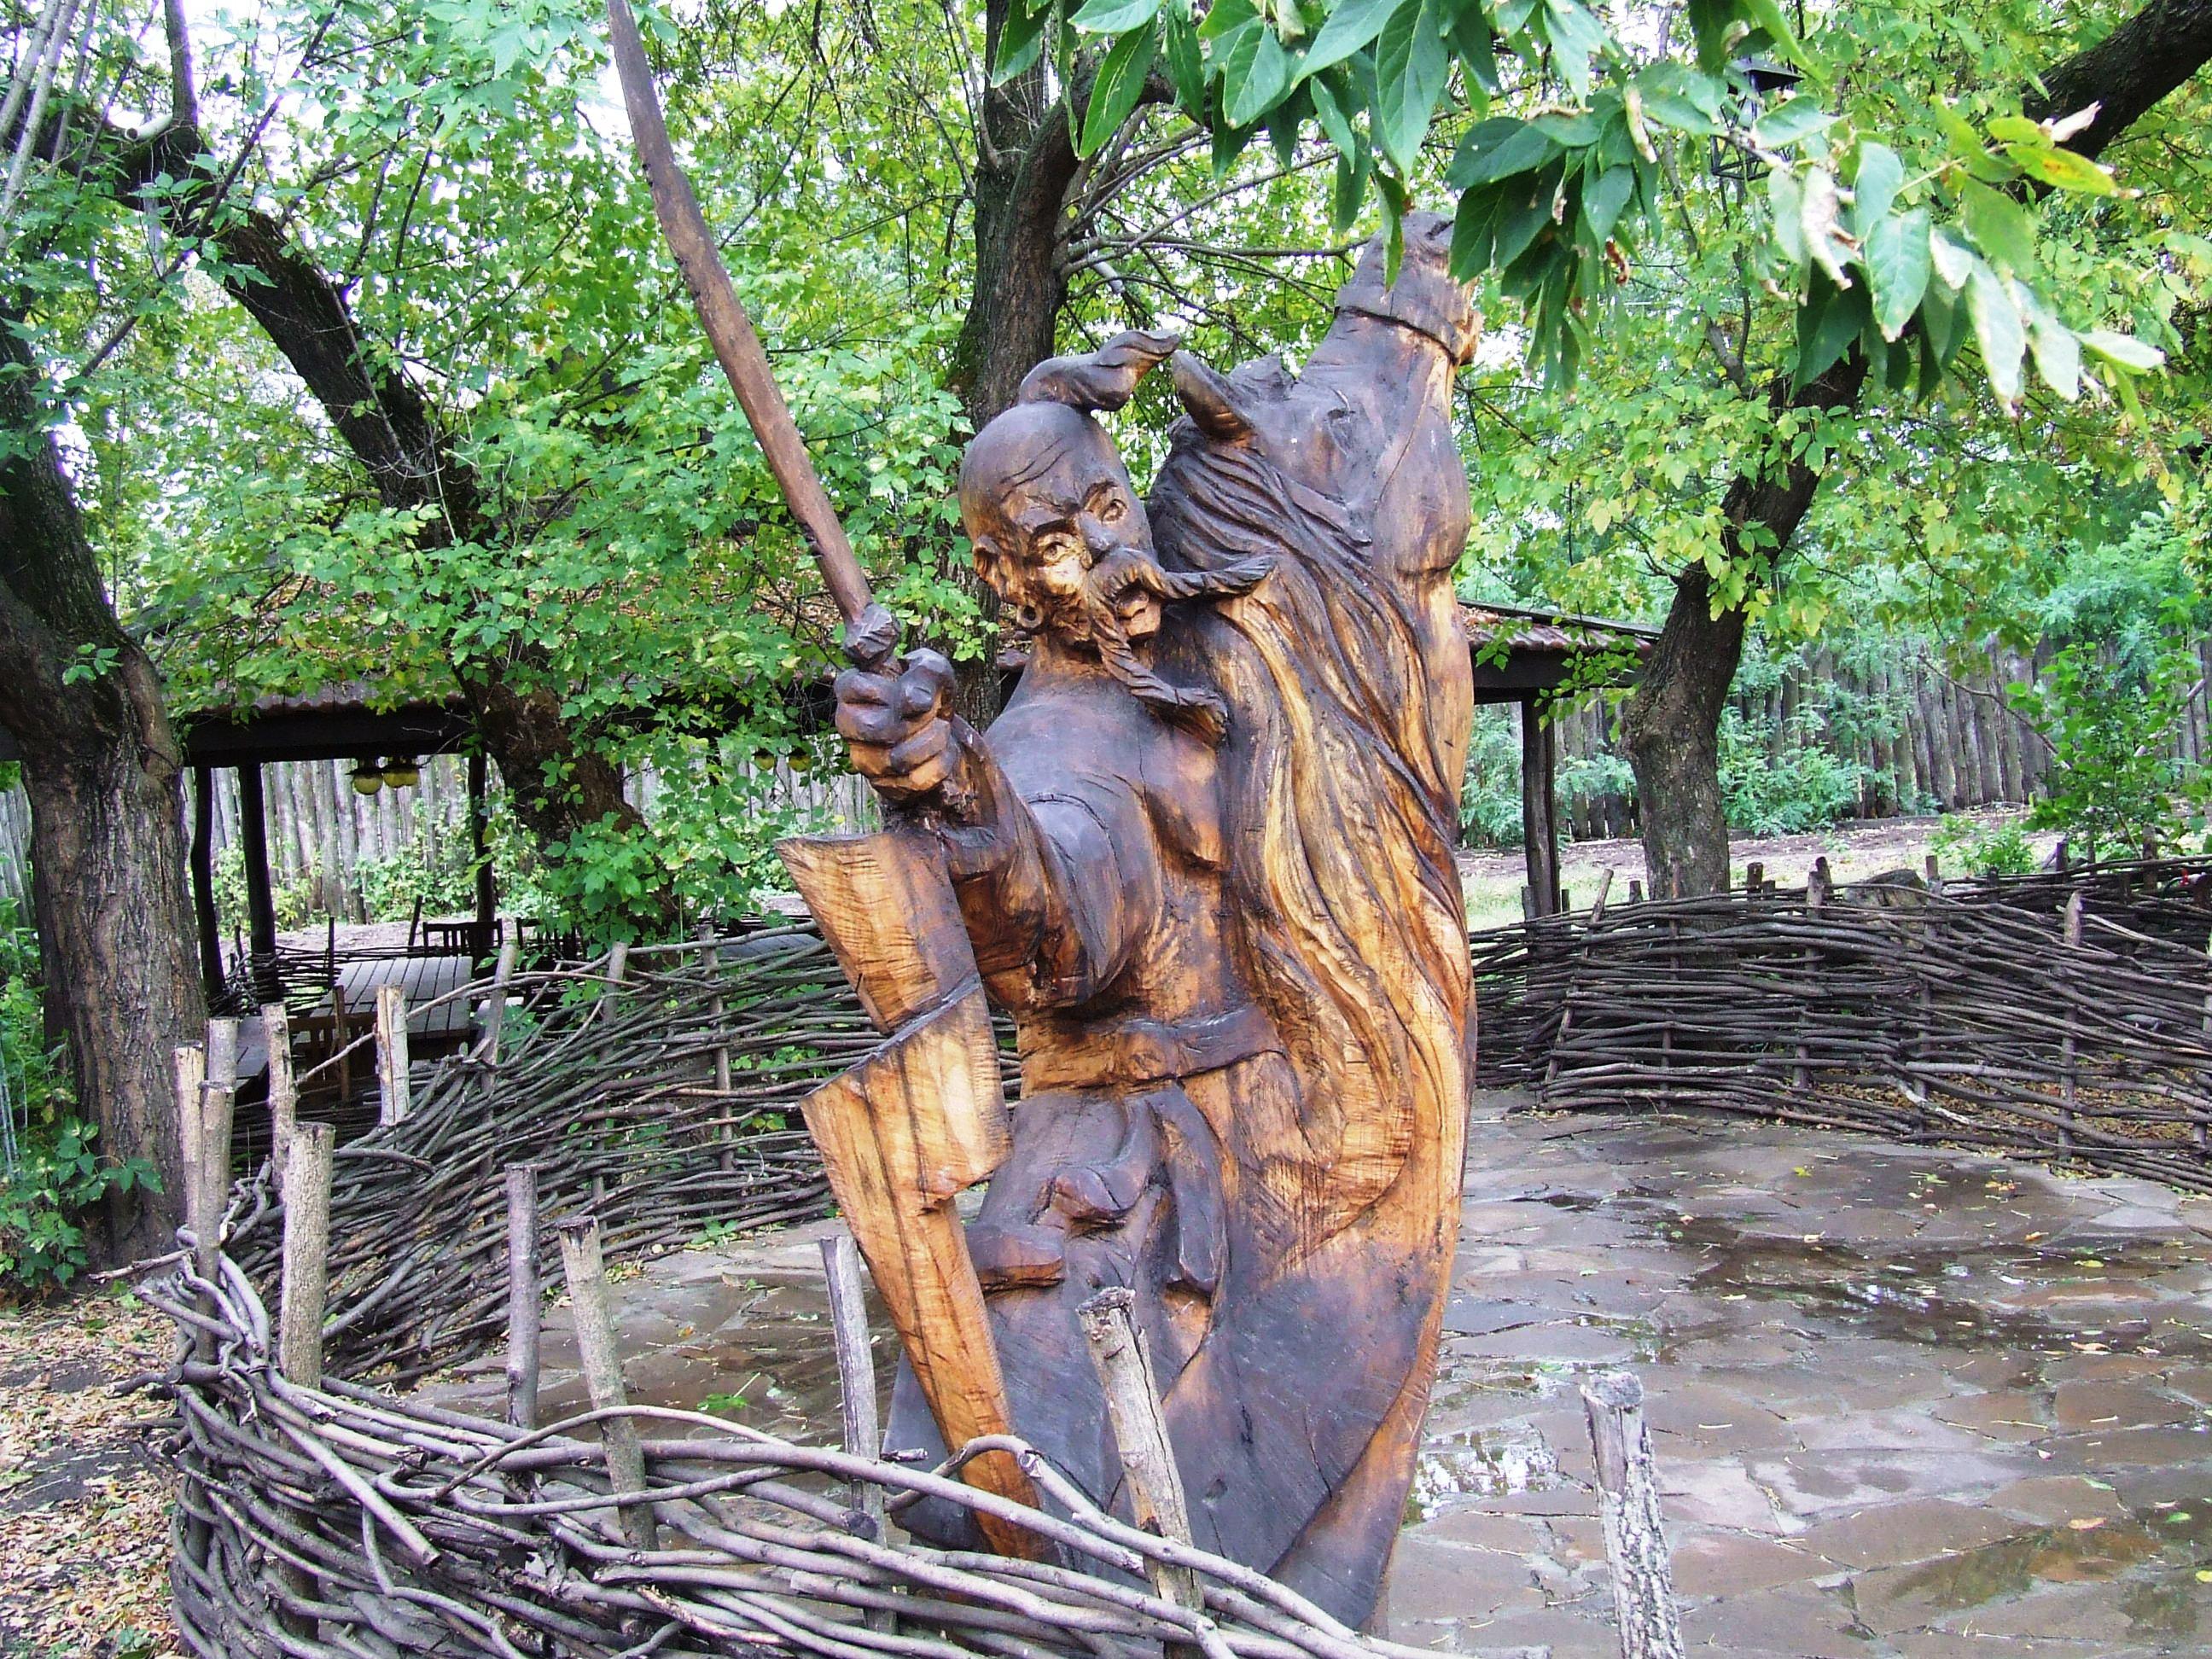 Секс на островах фото 2 фотография